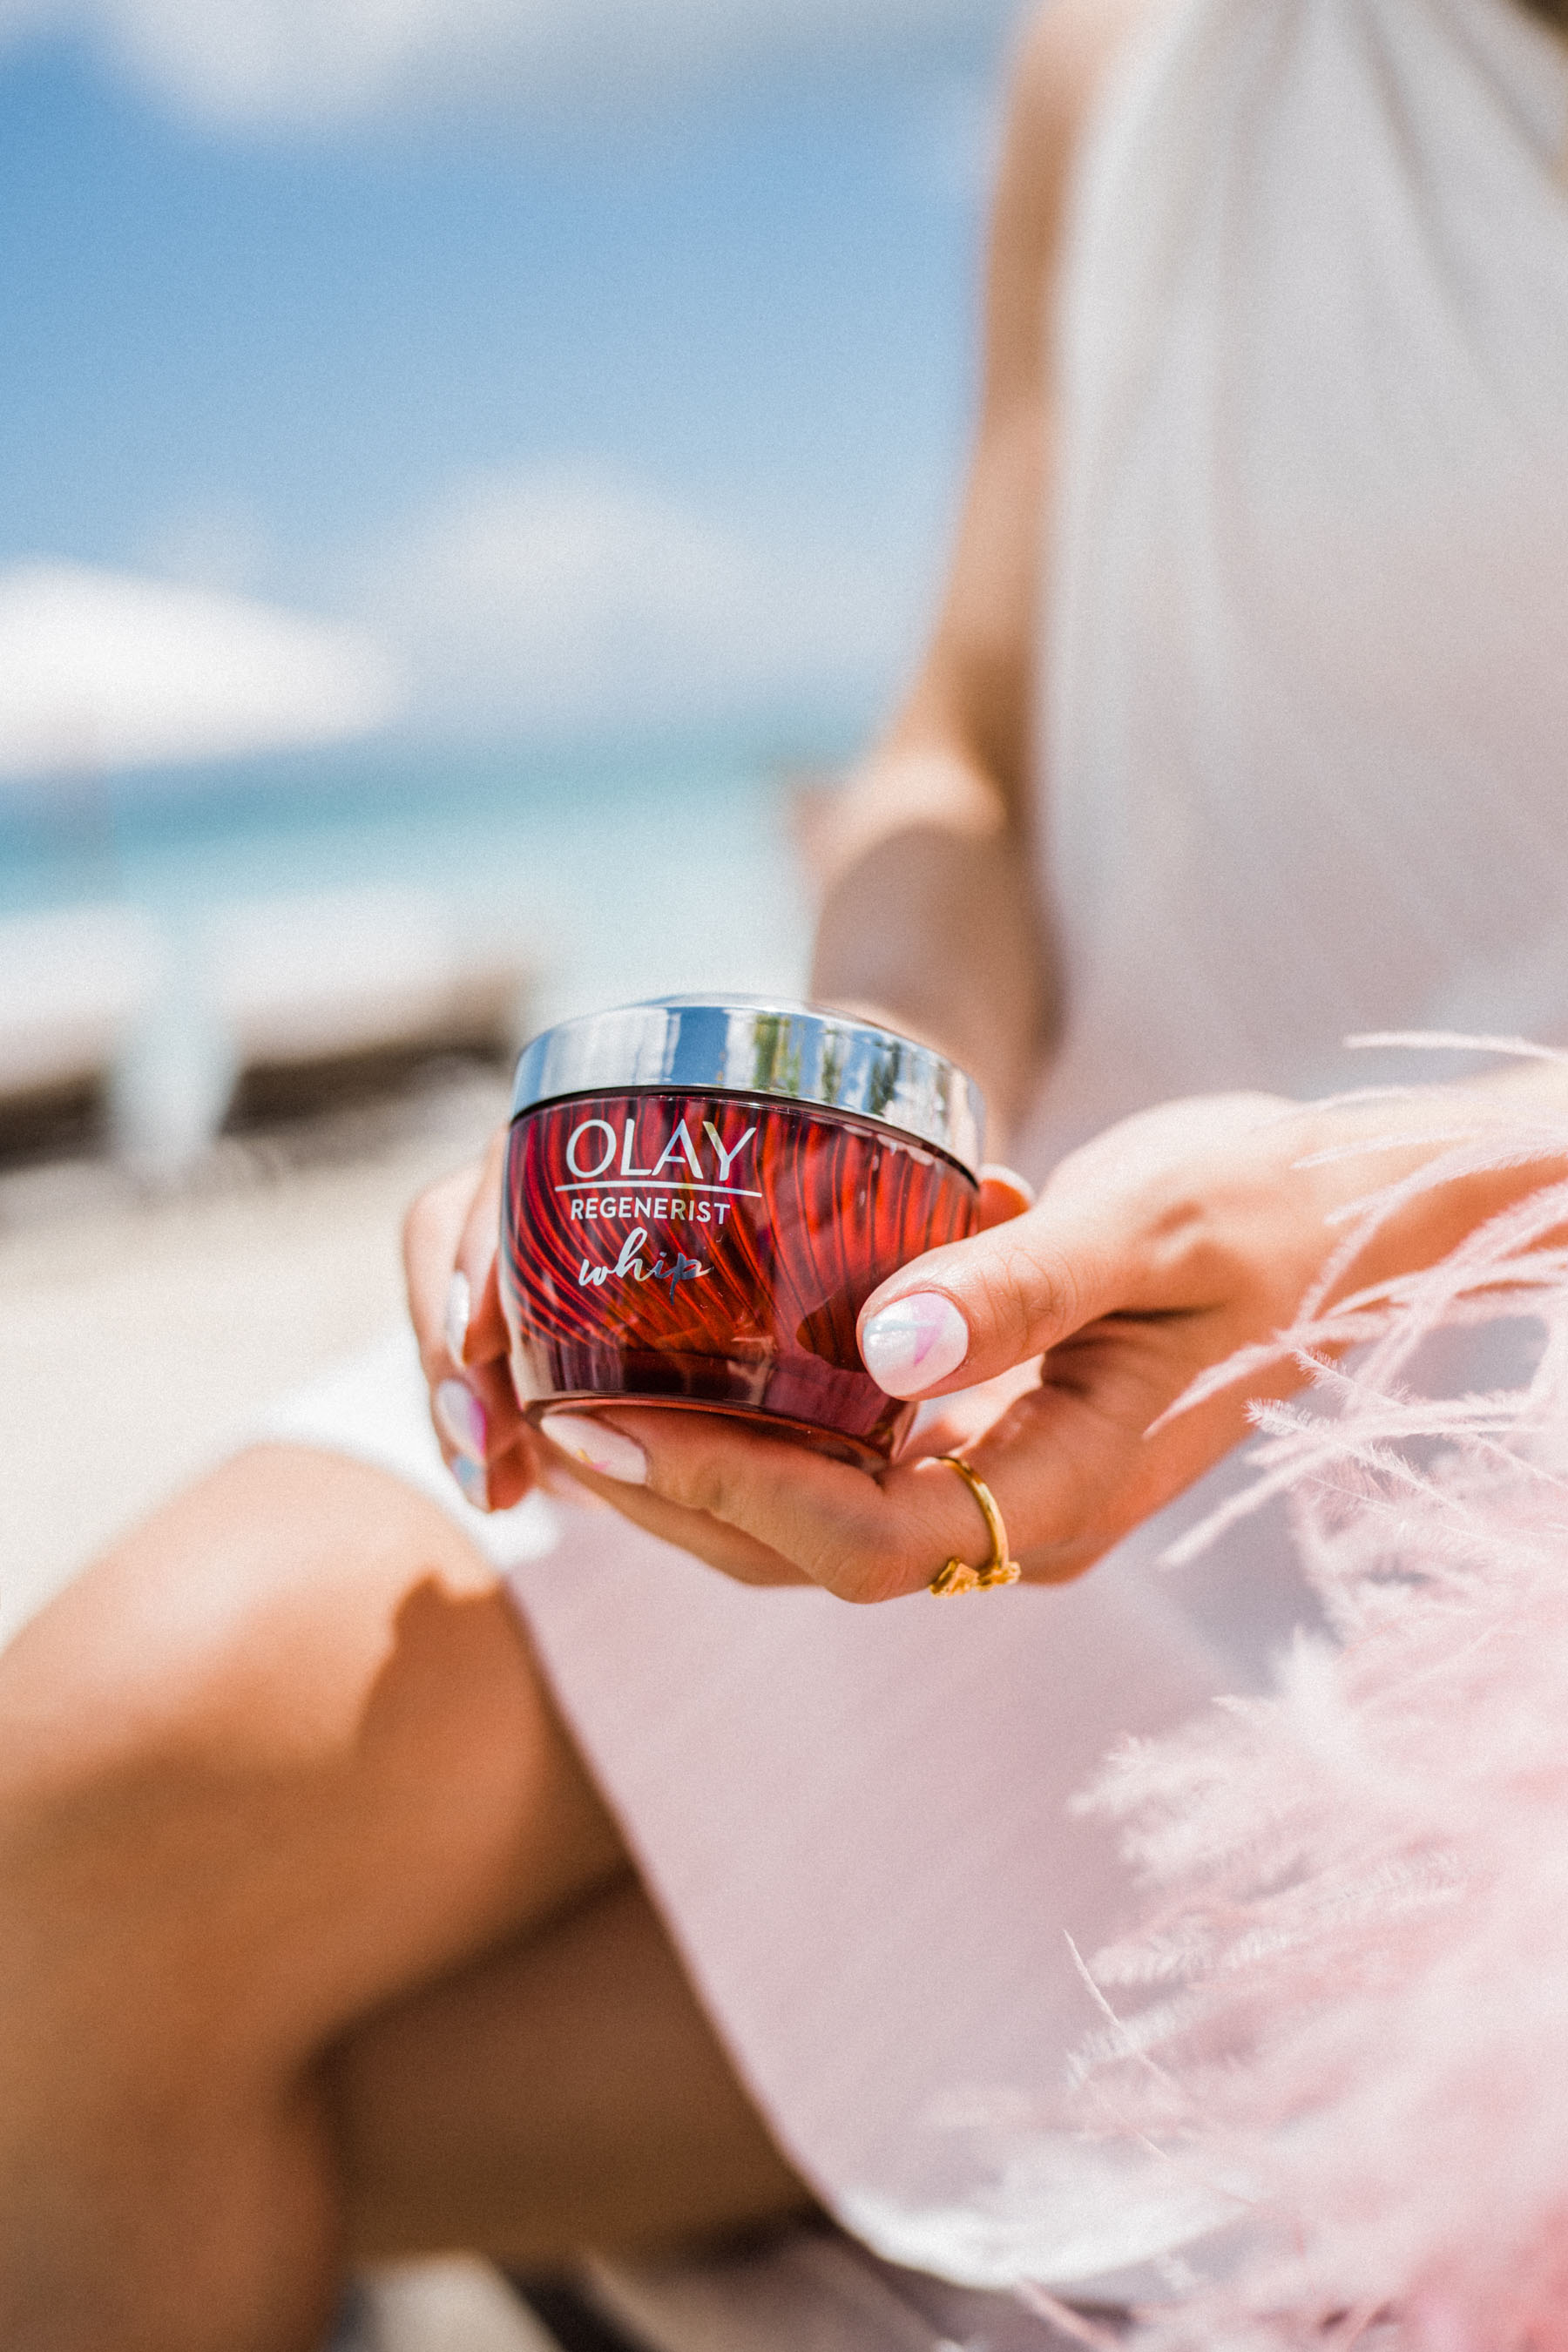 essential moisturizers for fresh summer skin, Olay regenerist whip face moisturizer // Notjessfashion.com